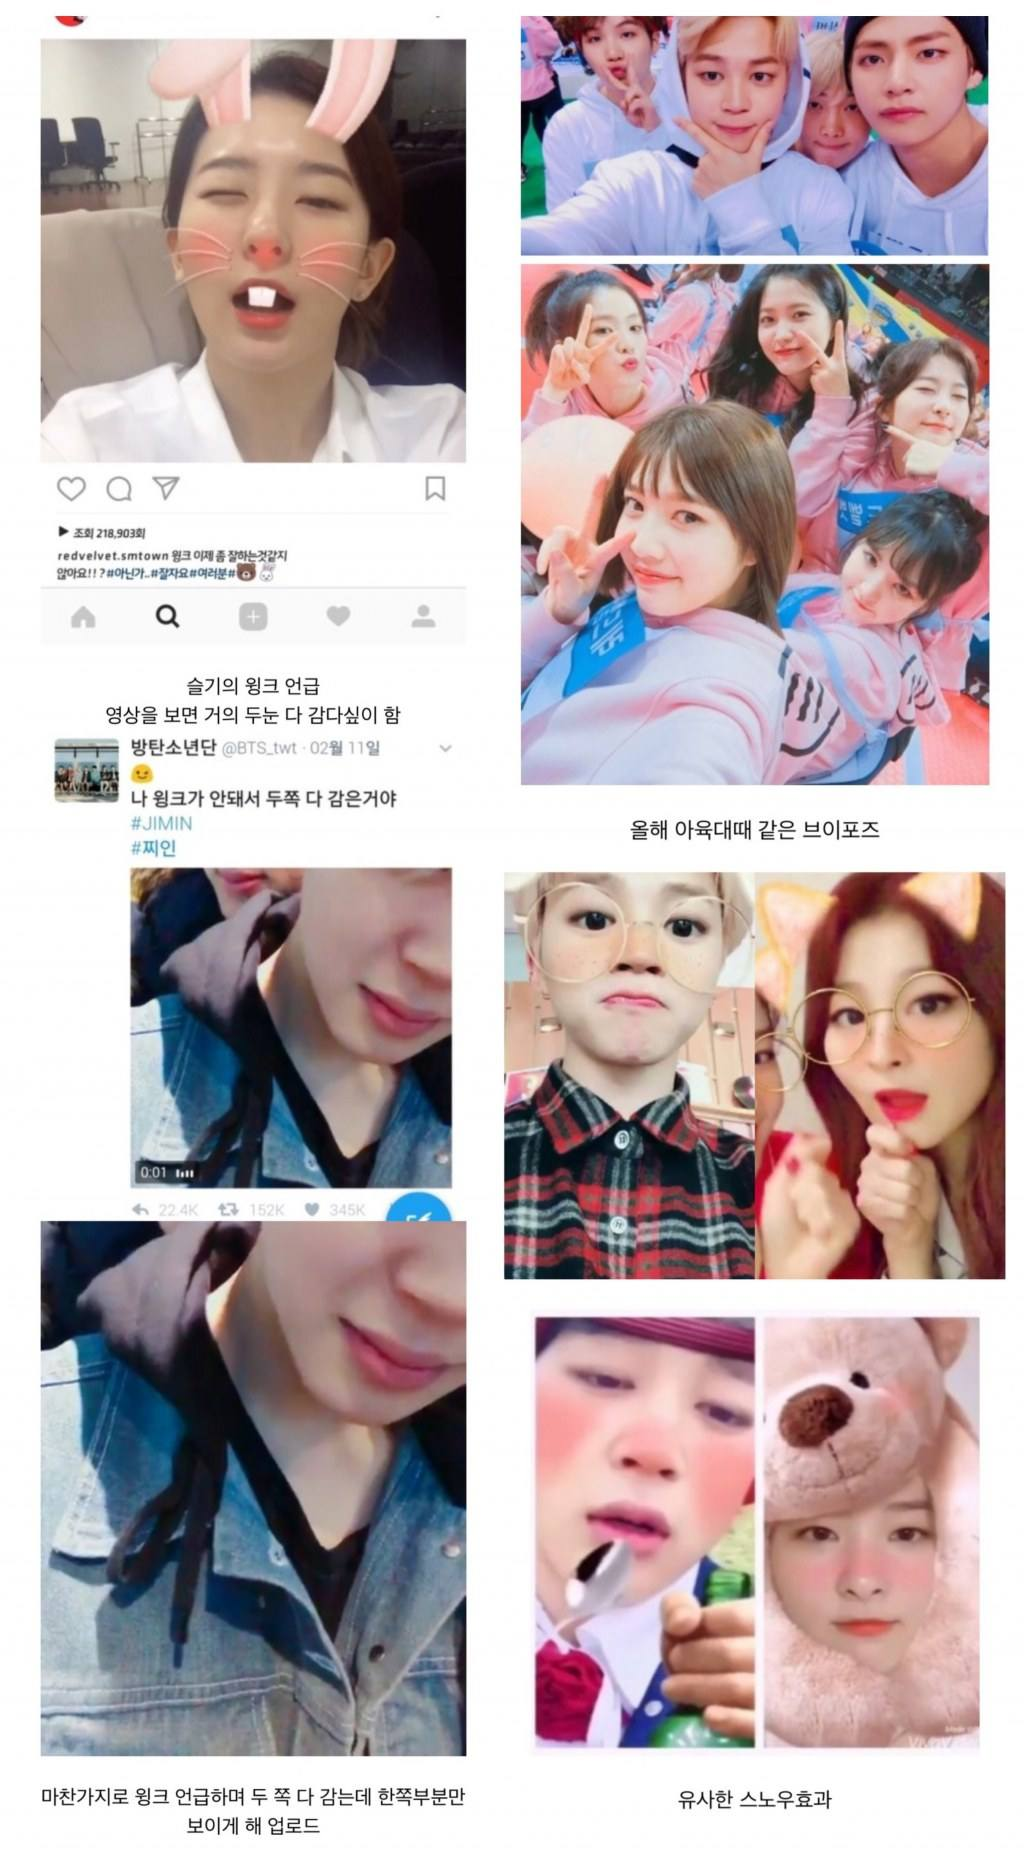 Dispatch seulgi jimin Netizens stir